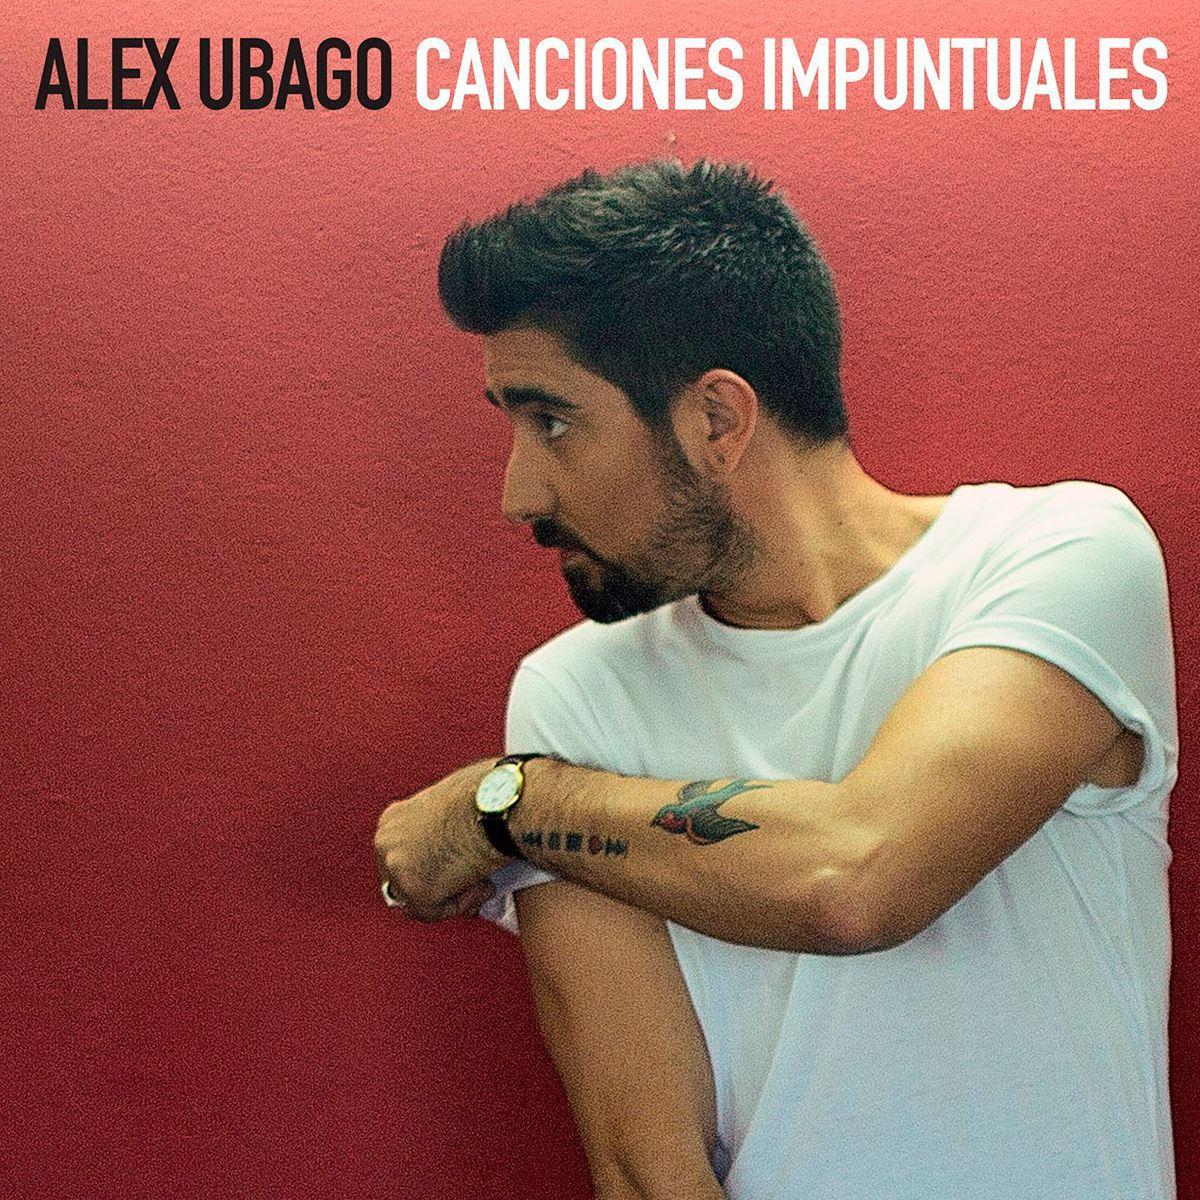 Cd alex ubago  canciones puntuales  - Sanborns